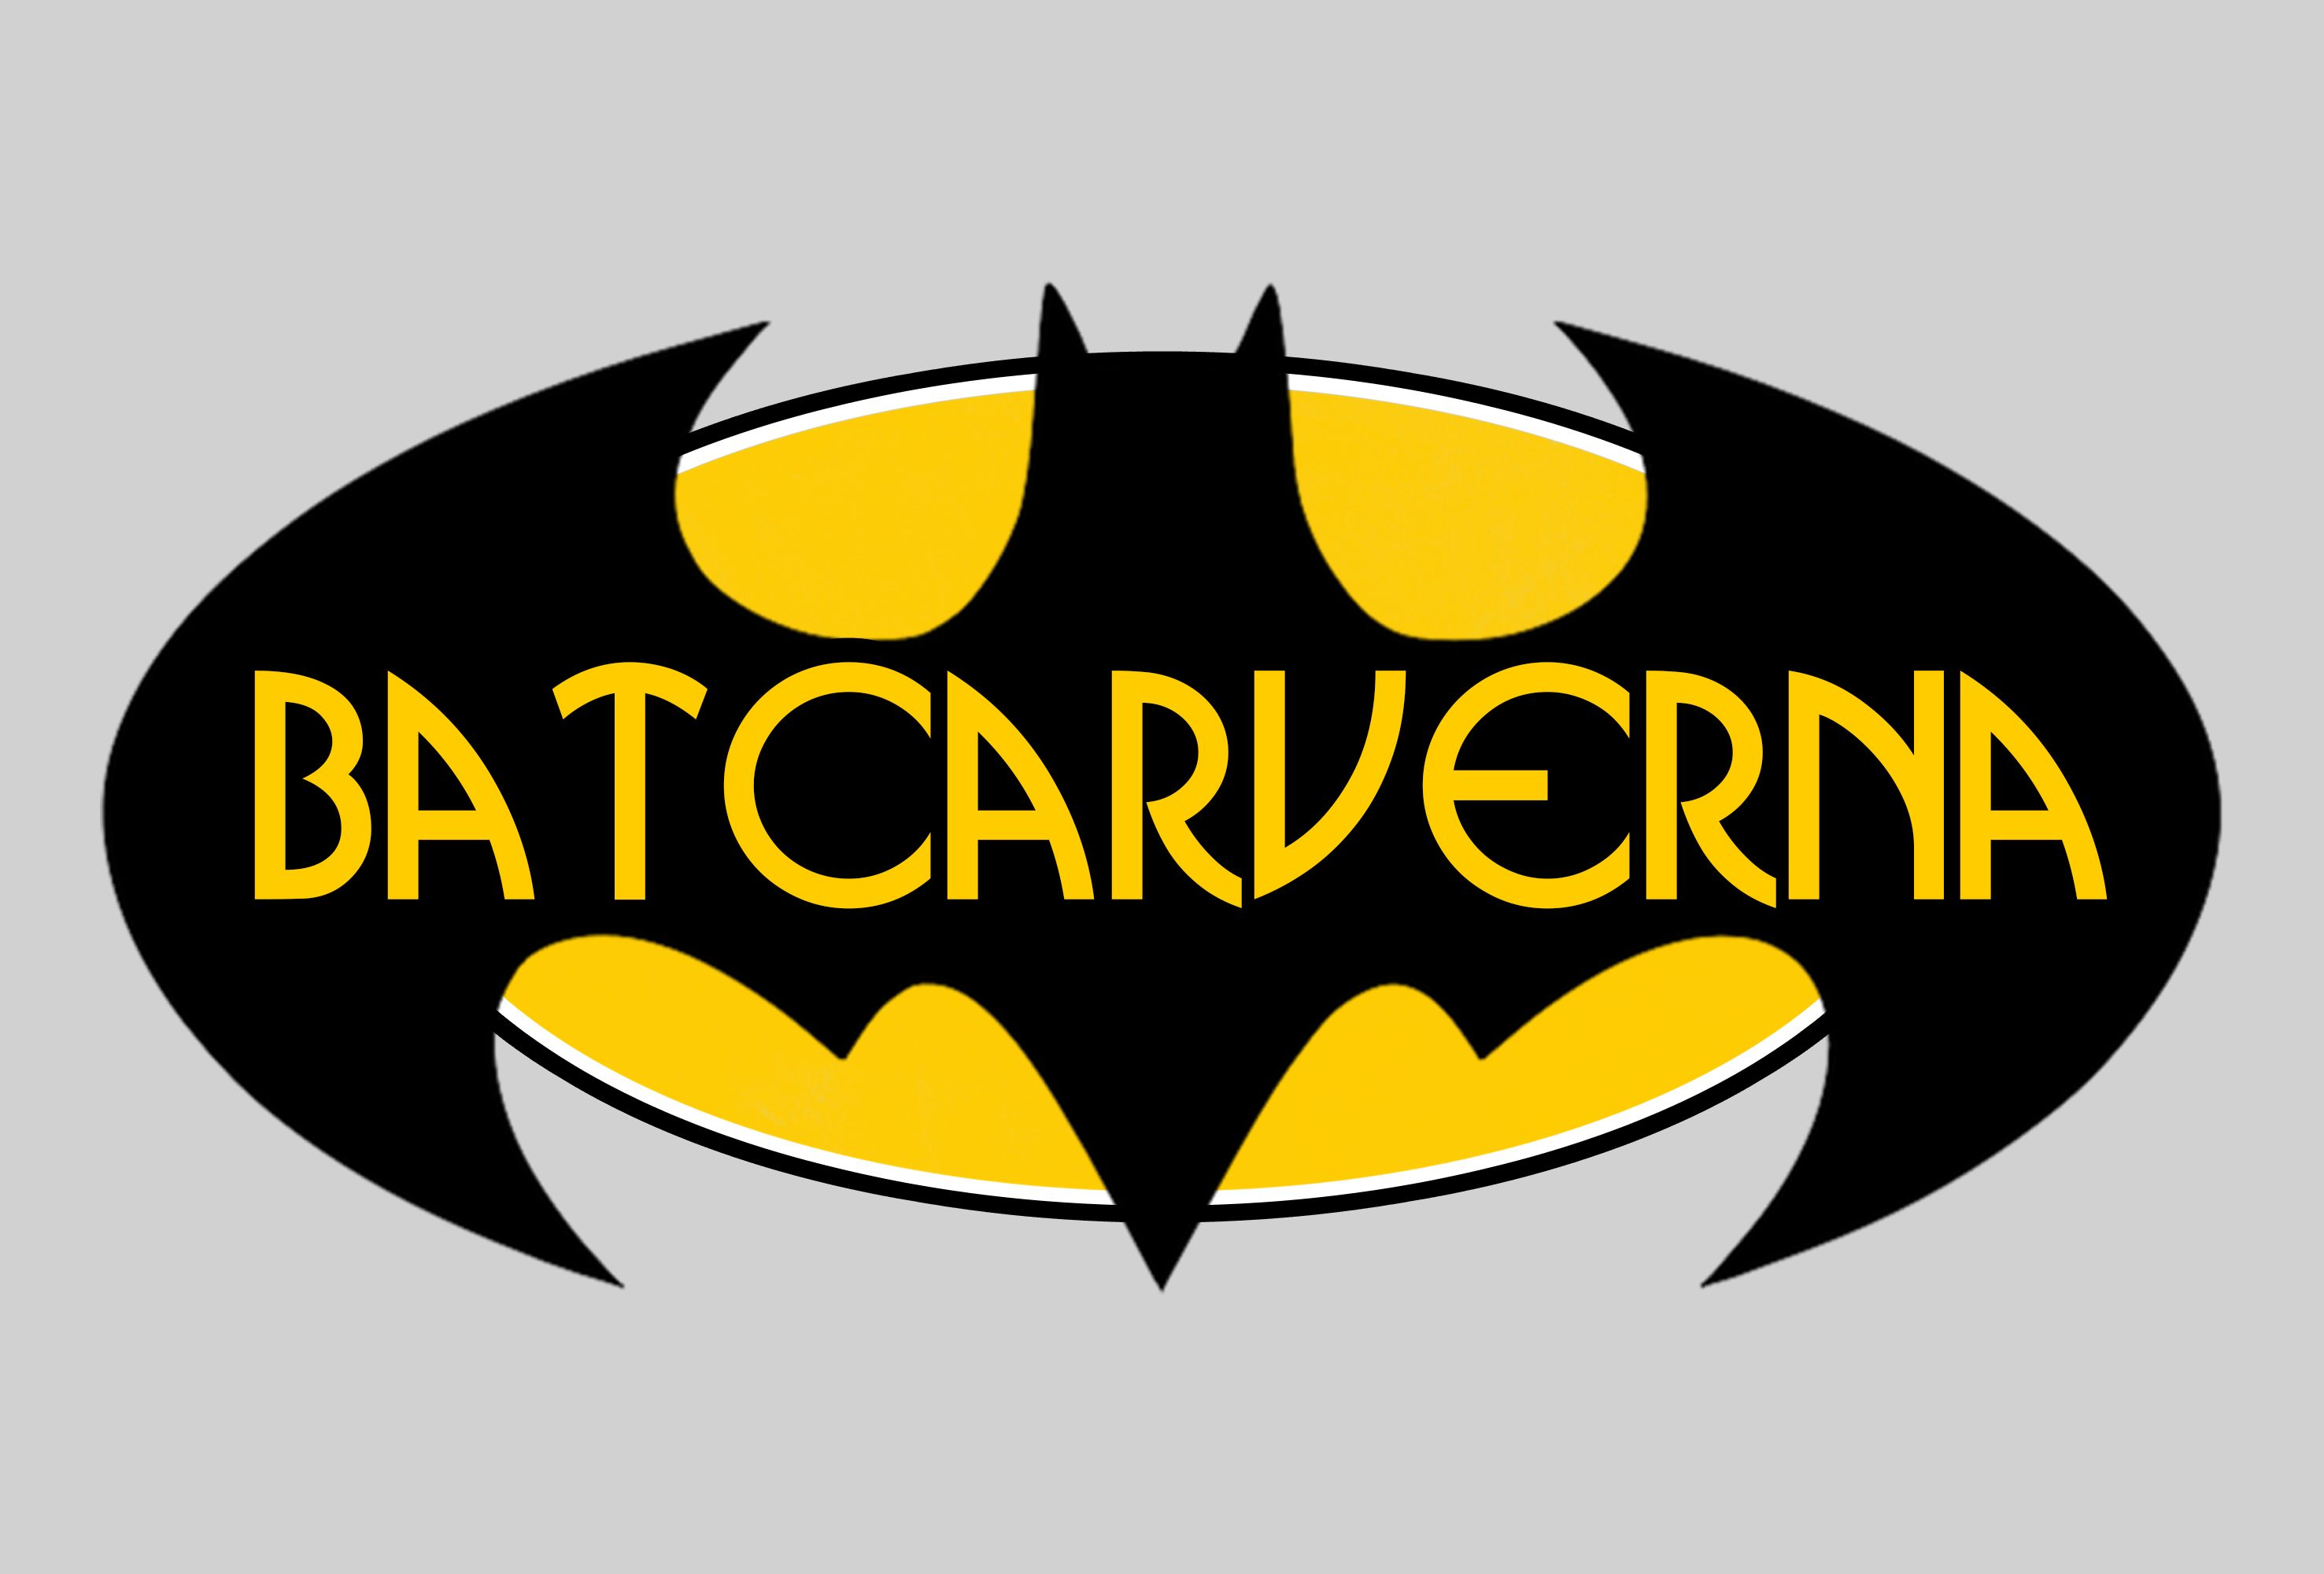 Pin de Manolo Hernández em Bat Galery Batcaverna